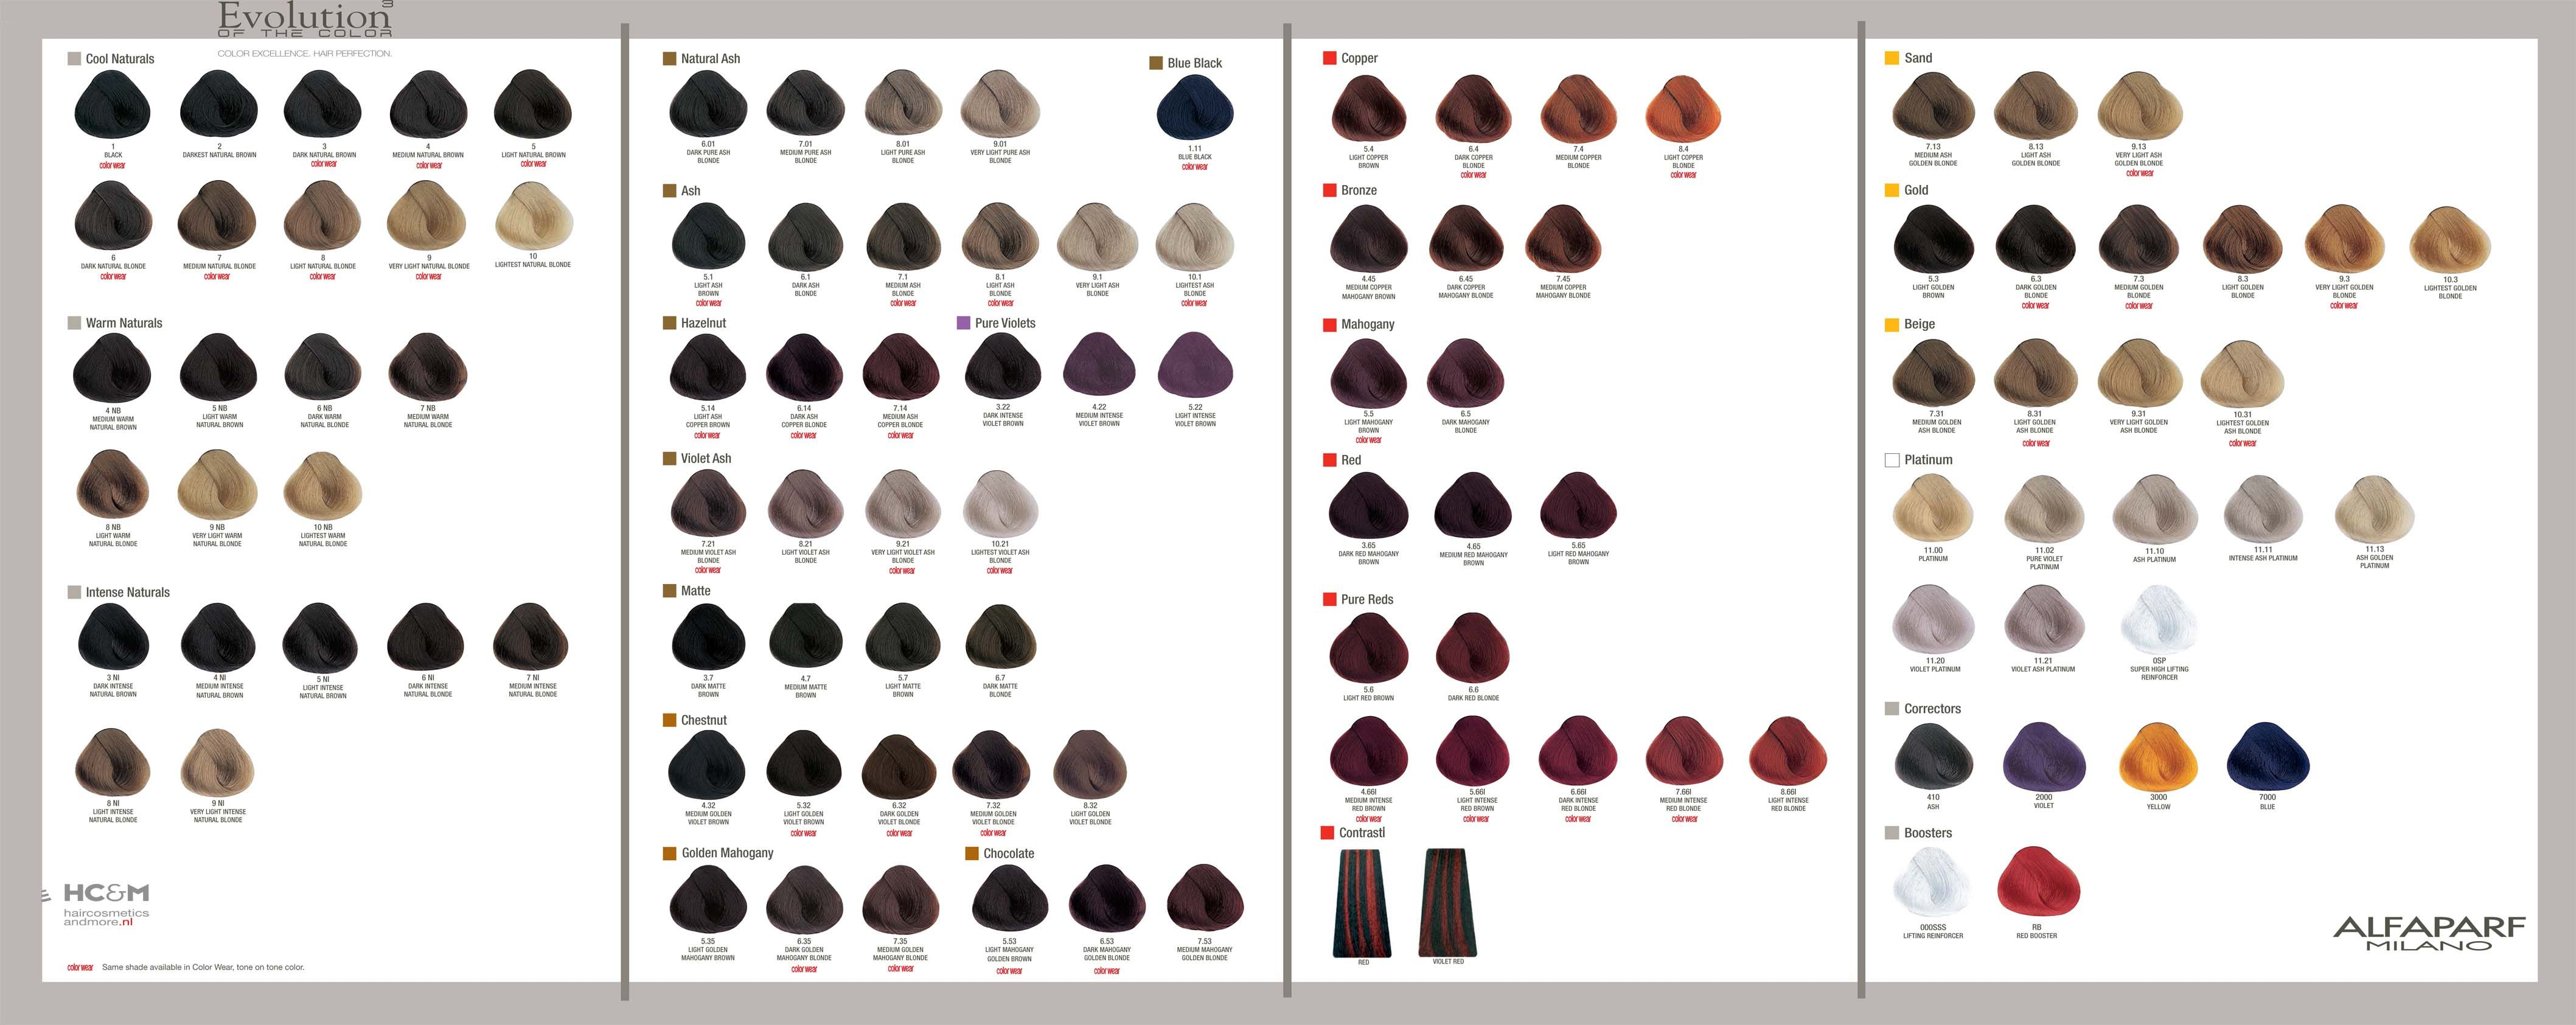 Majirel colour chart - Majirel 8 Blonde Natural Google Gingerheads Pinterest Blondes Copper Red And Natural